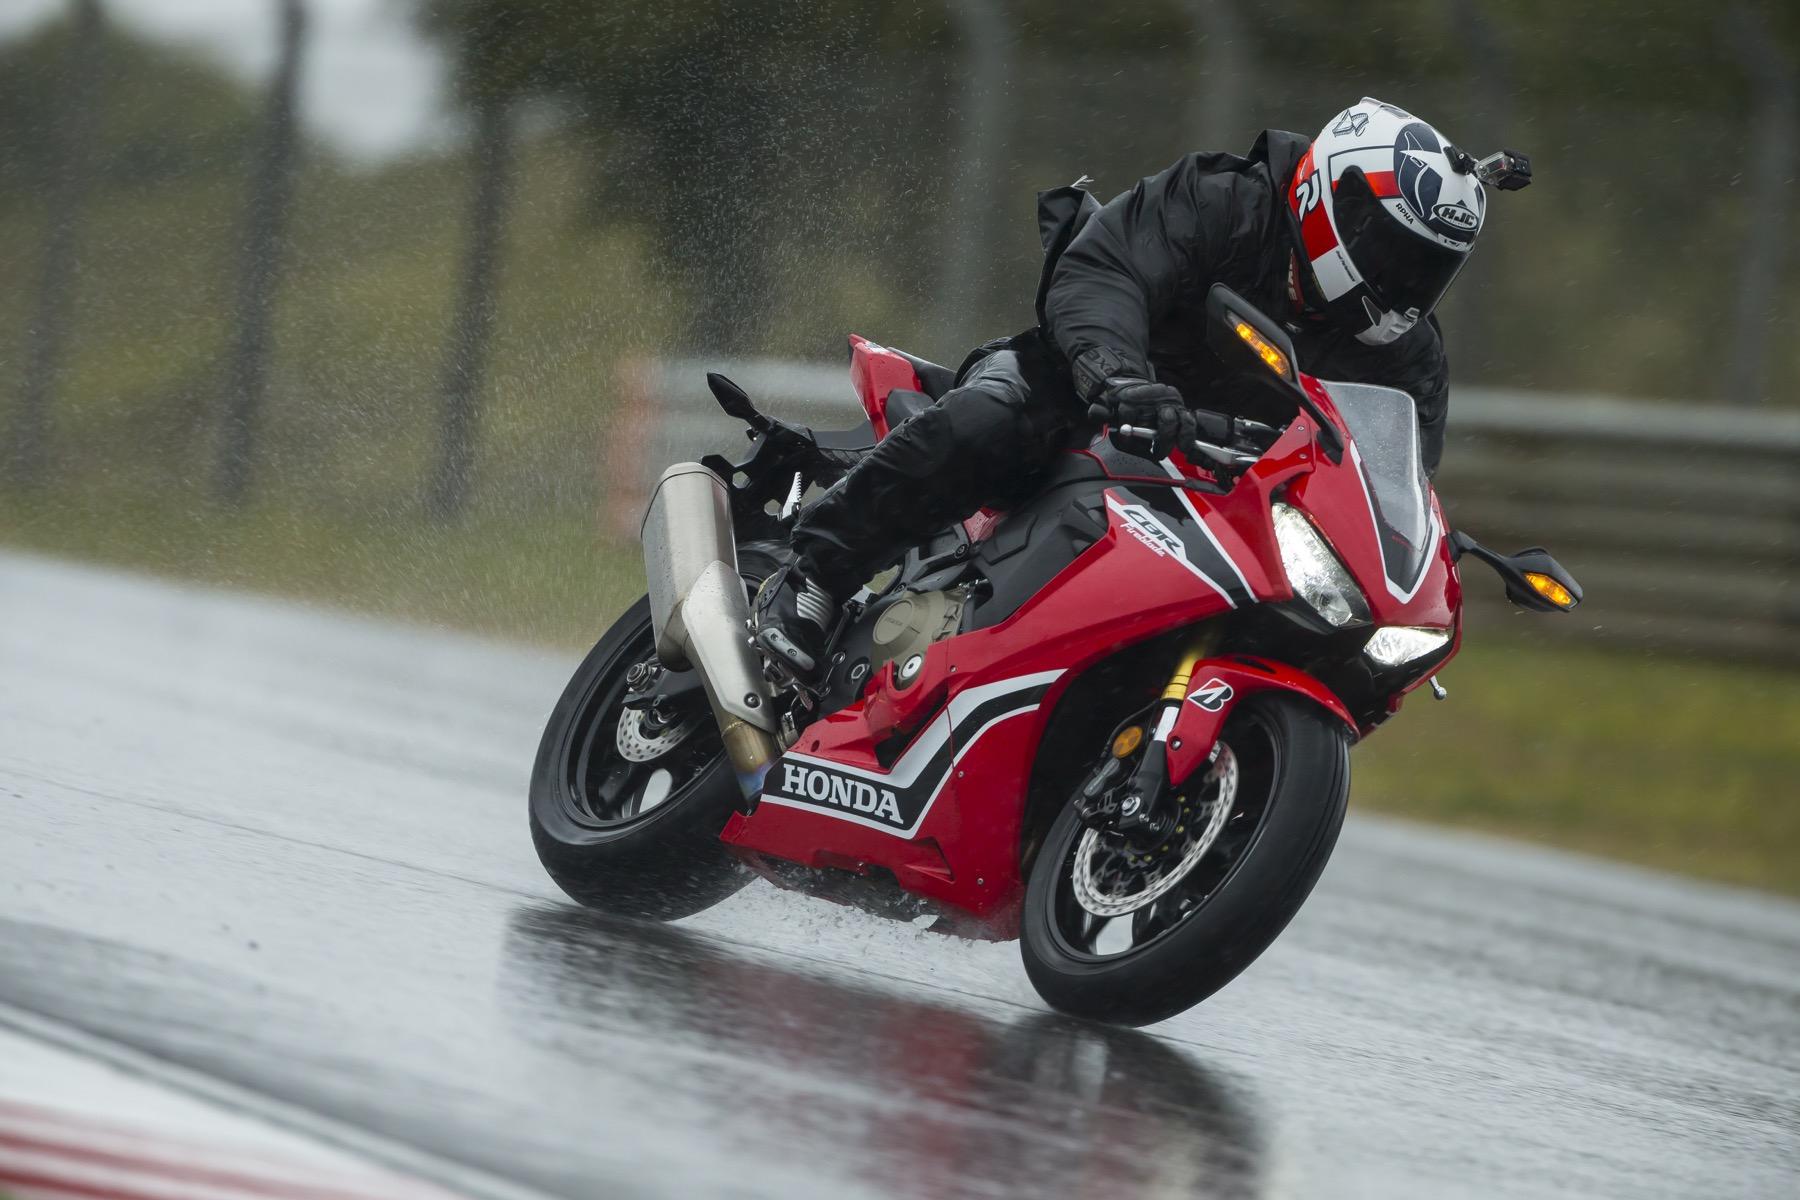 Honda CBR 1000 RR / SP 2017, prueba